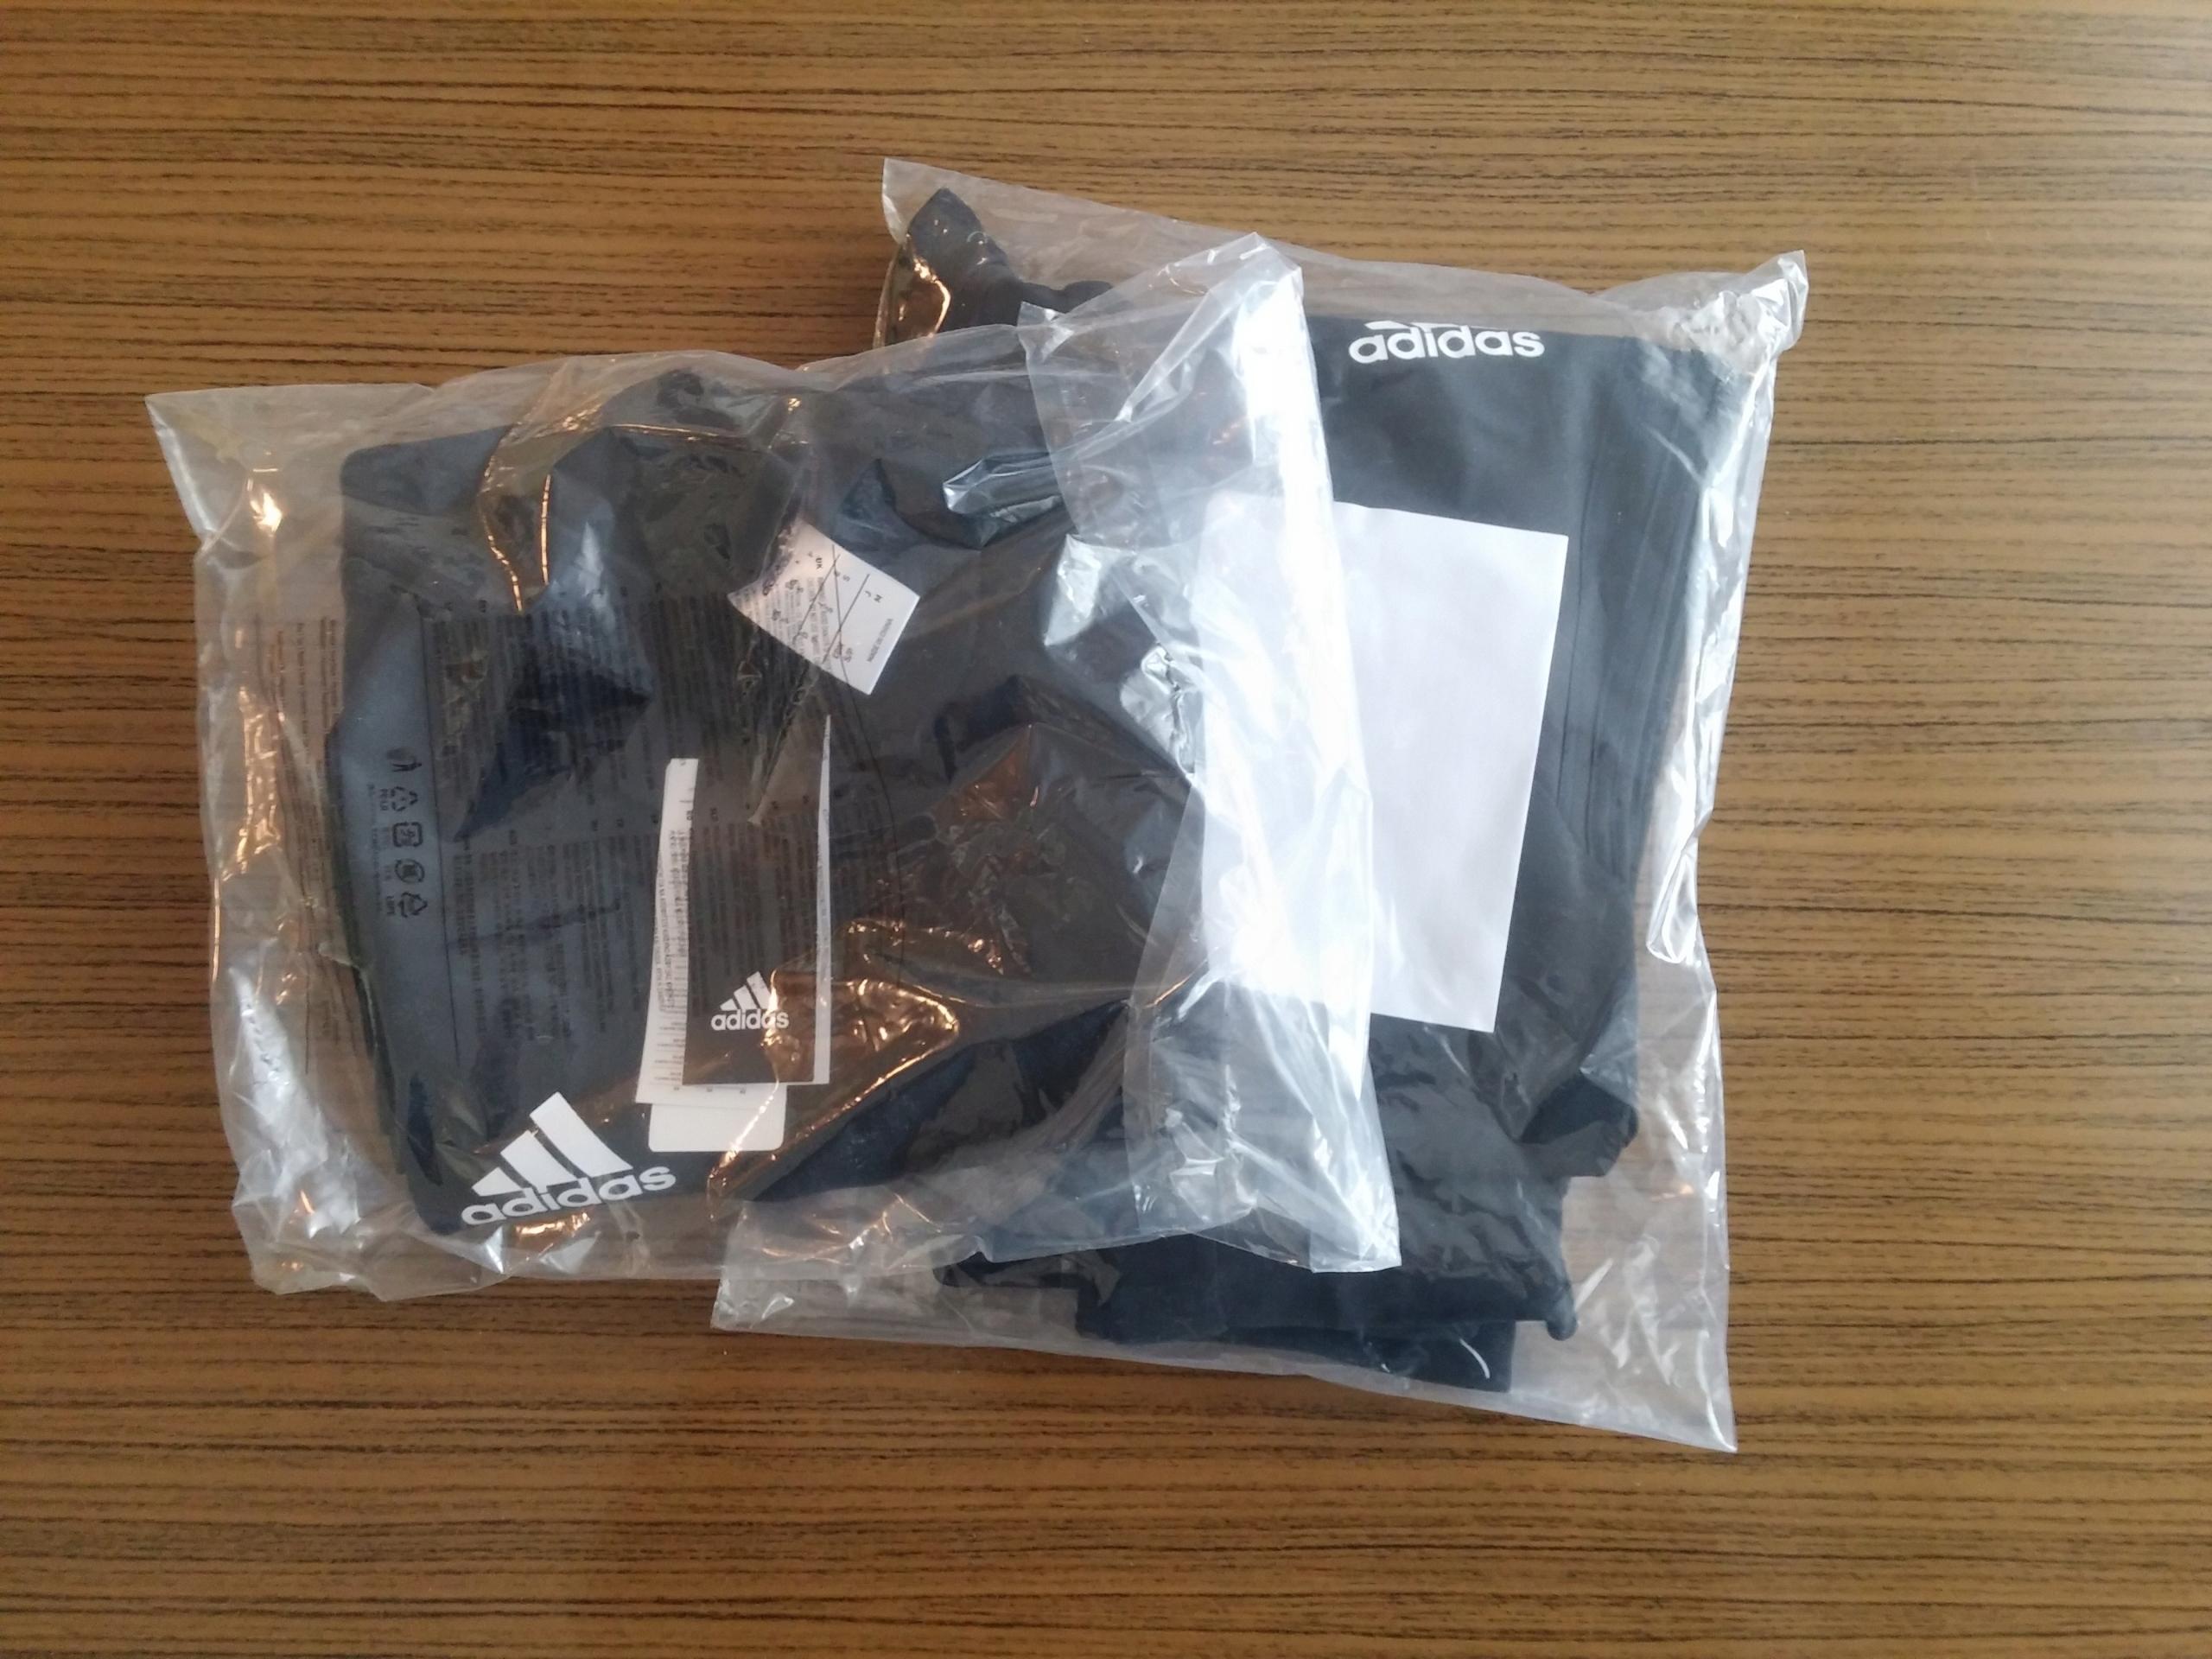 Adidas Tiro 17 tiro17 rozmiar S climacool spodnie